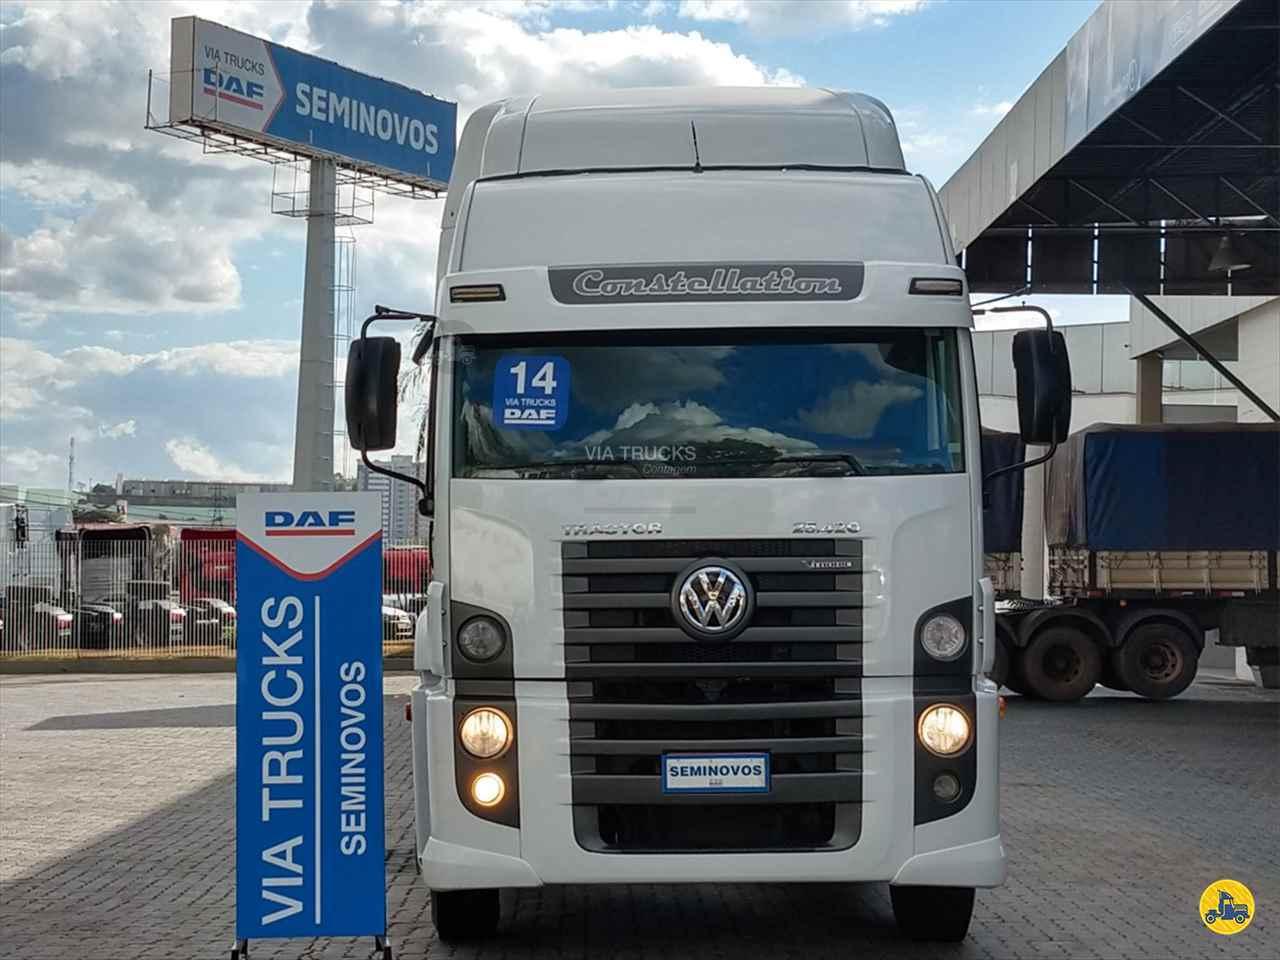 VOLKSWAGEN VW 25420 428000km 2014/2014 Via Trucks - DAF